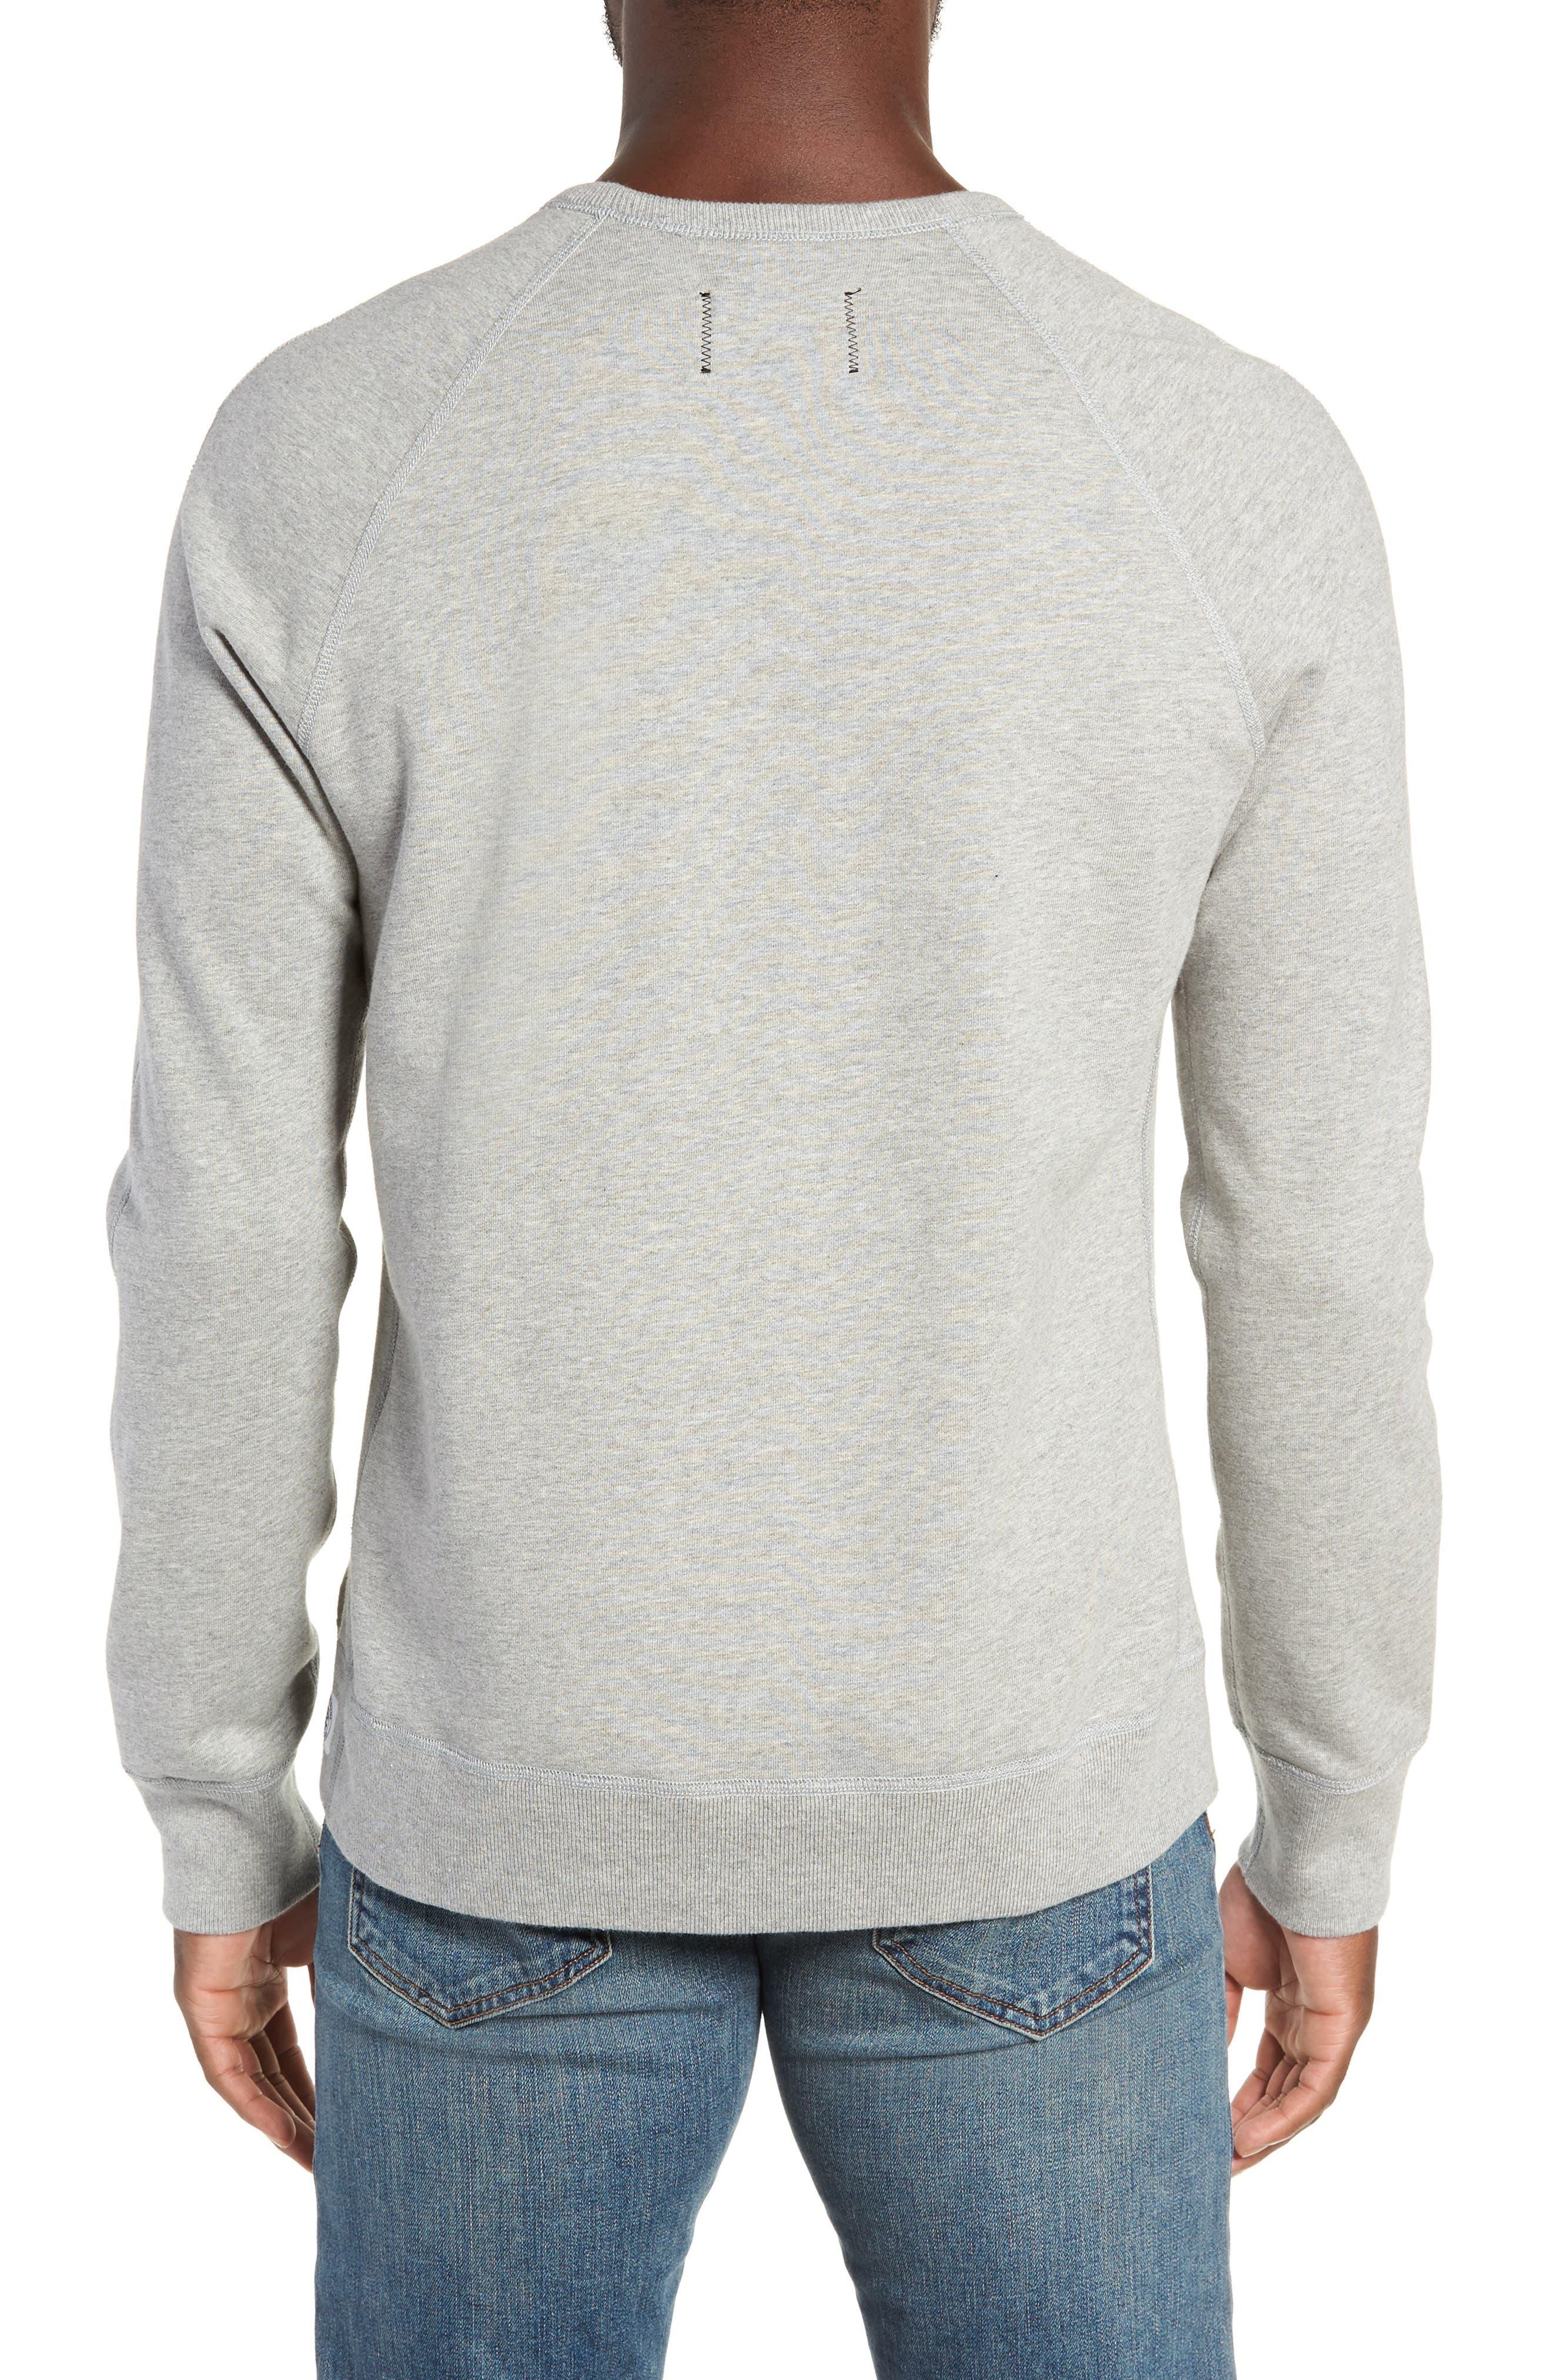 REIGNING CHAMP, Gym Logo Sweatshirt, Alternate thumbnail 2, color, HEATHER GREY/ BLACK